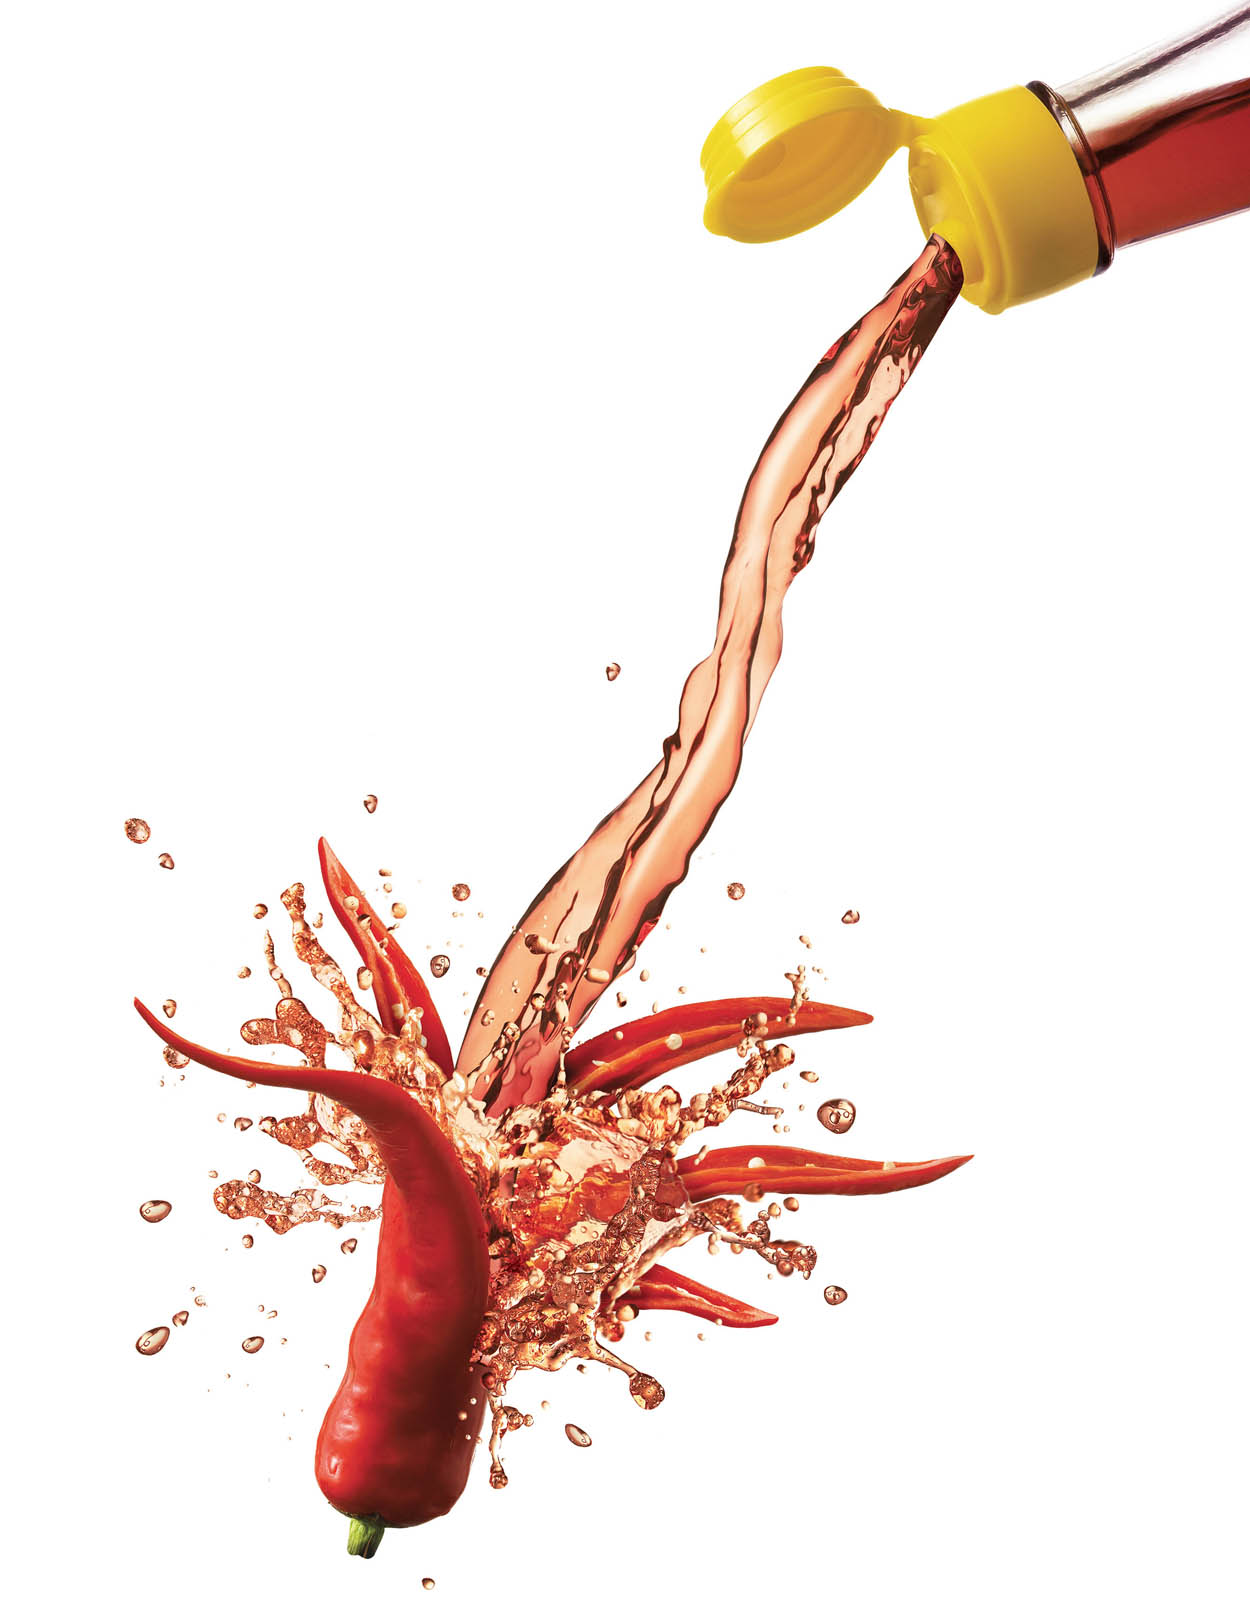 Knorr copy(Resize).jpg